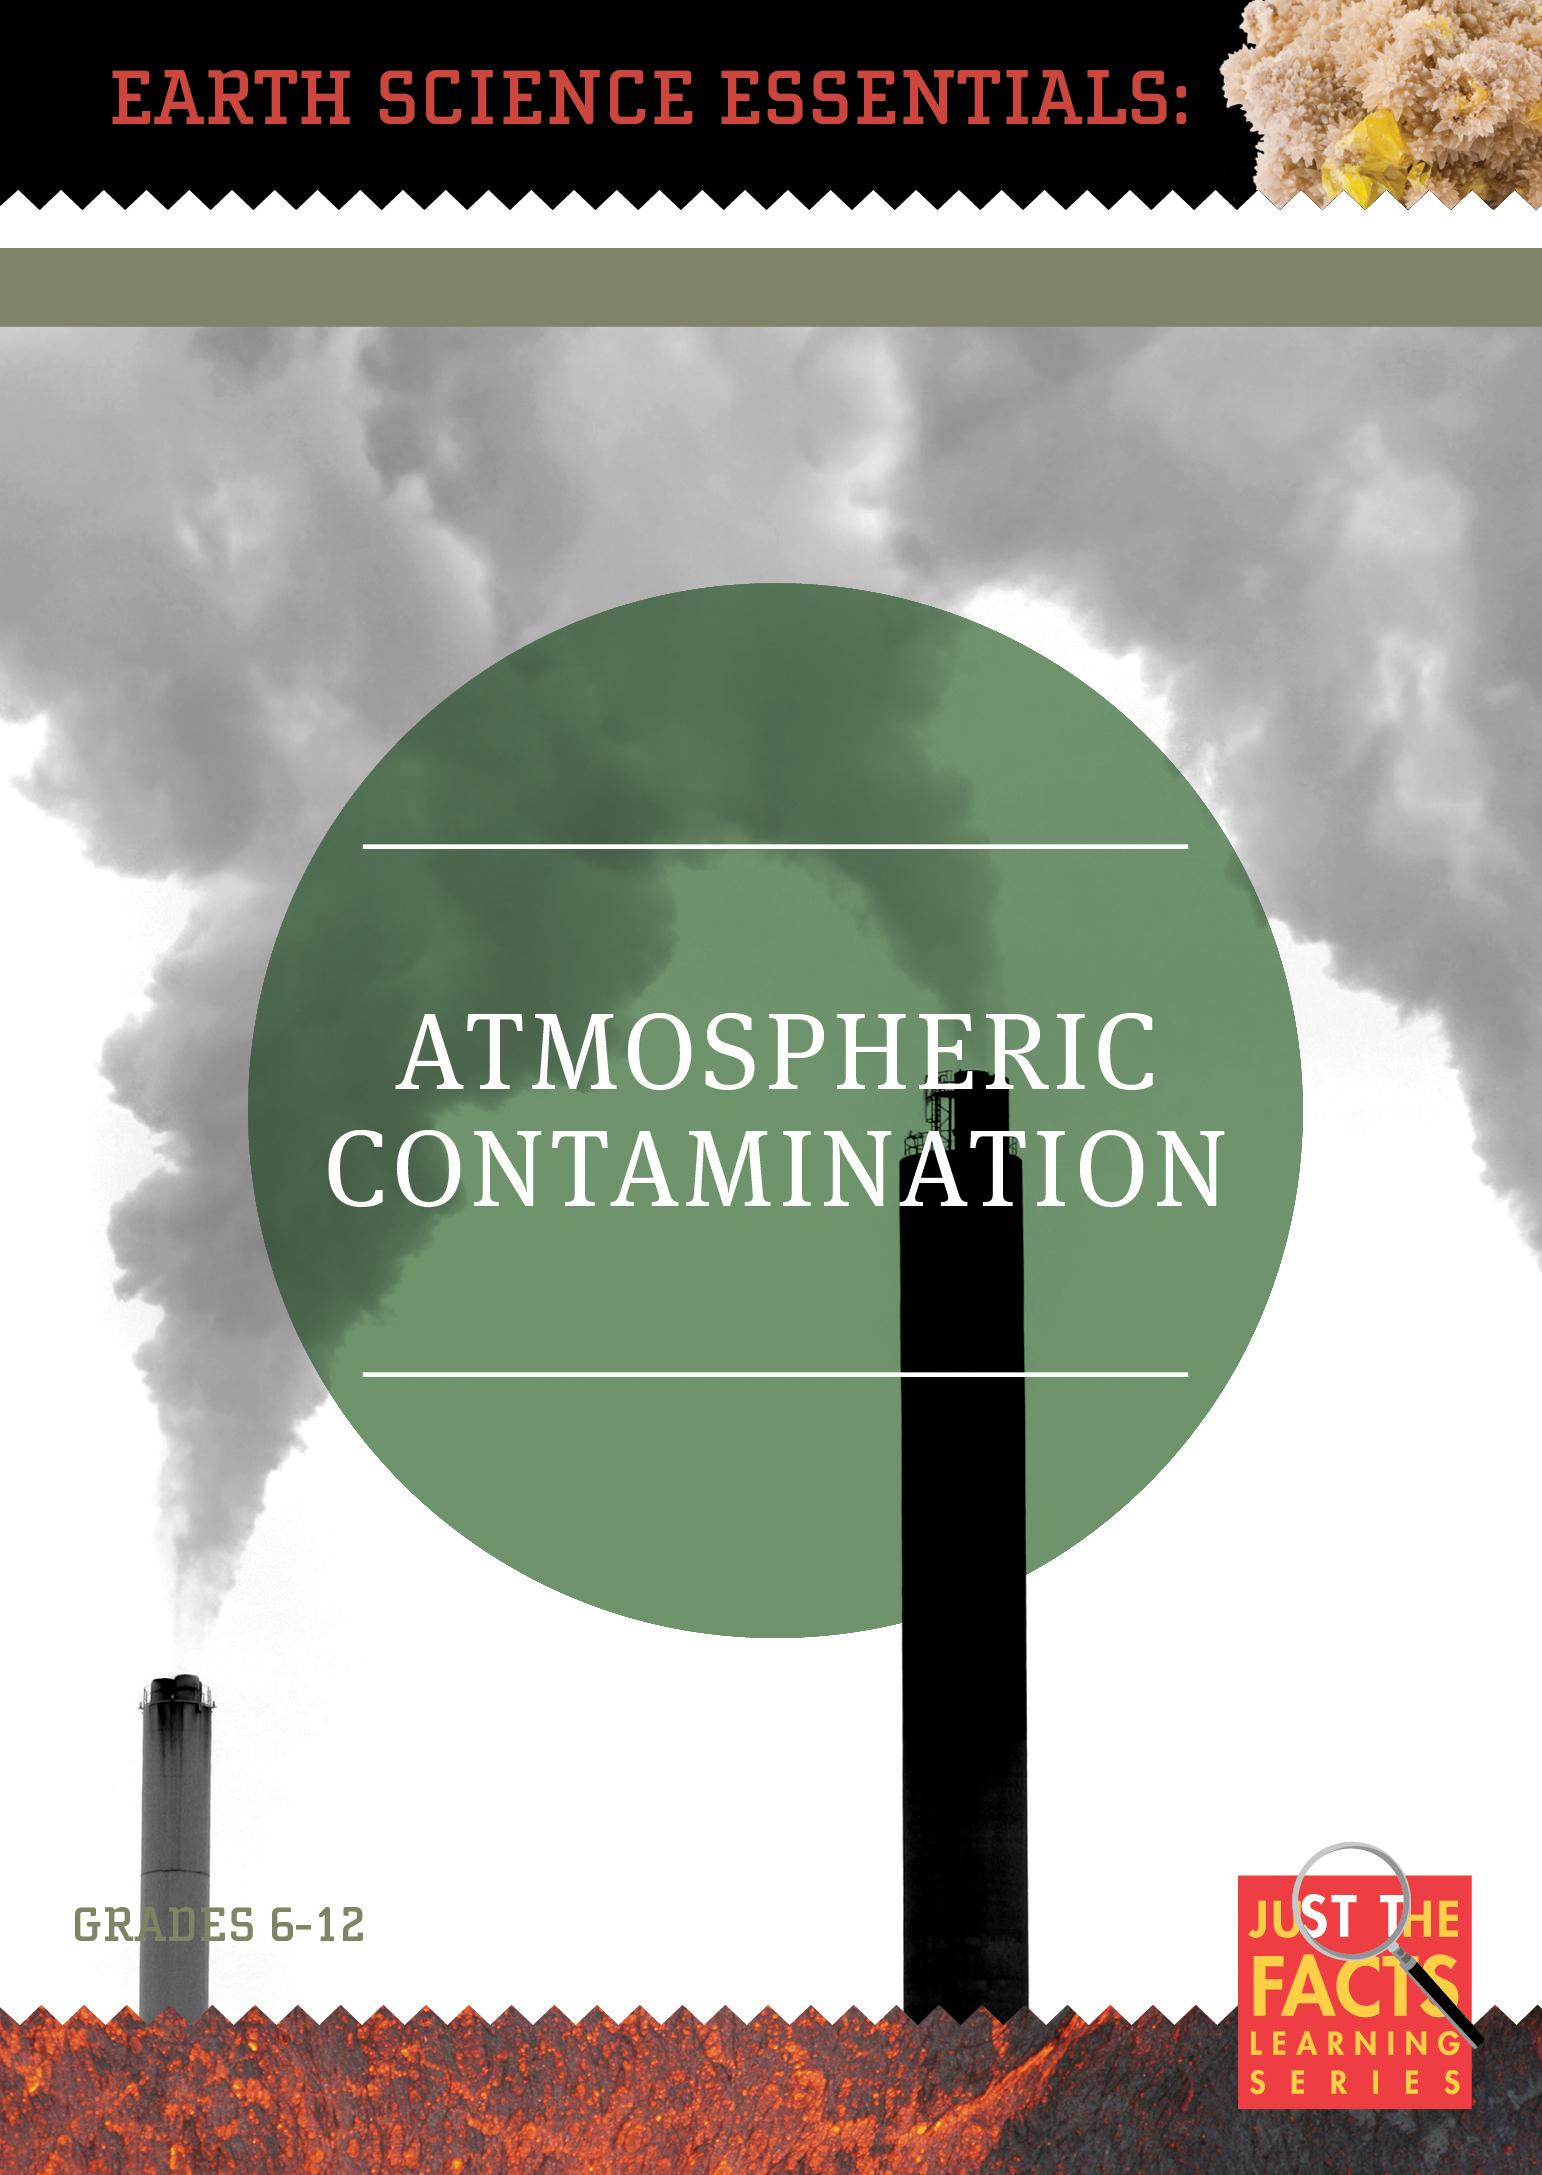 Earth Science Essentials: Atmospheric Contamination